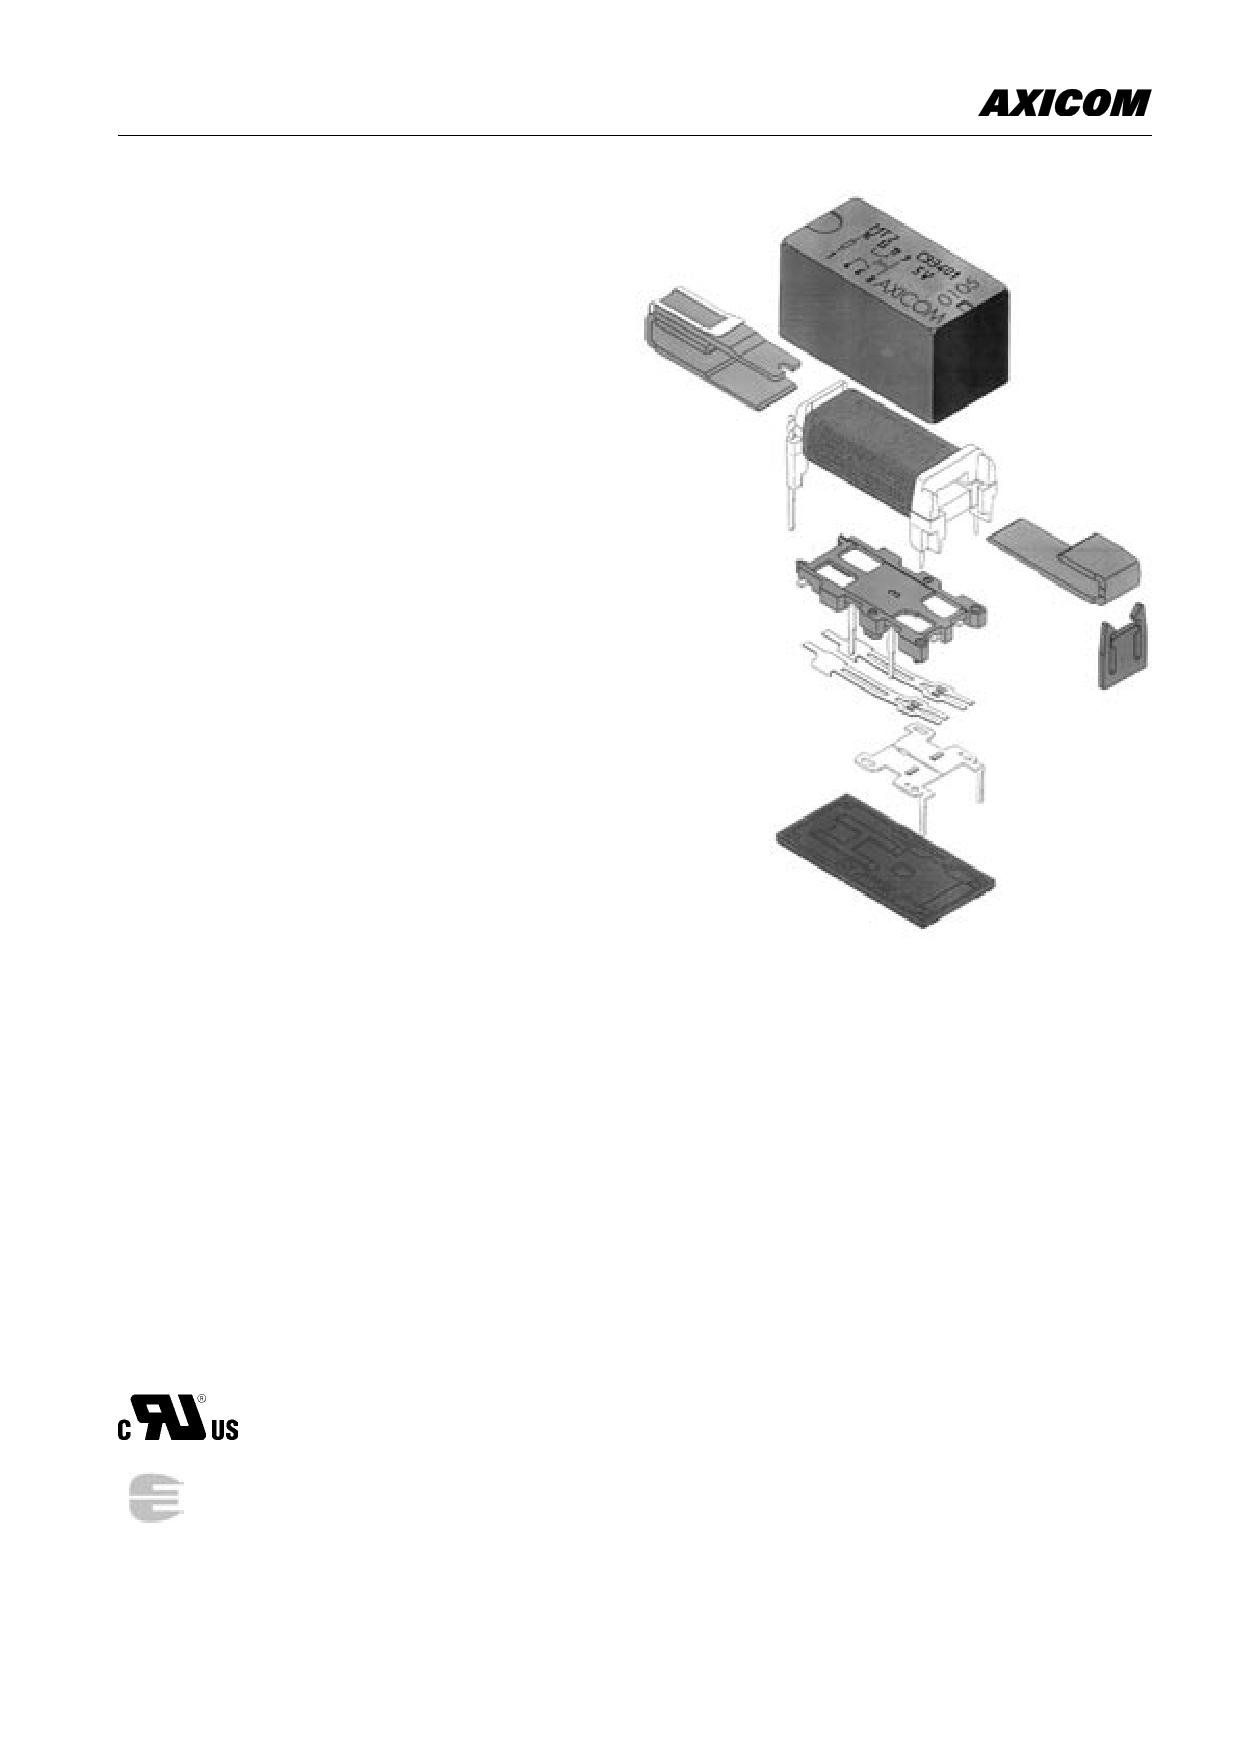 5-1462000-0 Даташит, Описание, Даташиты